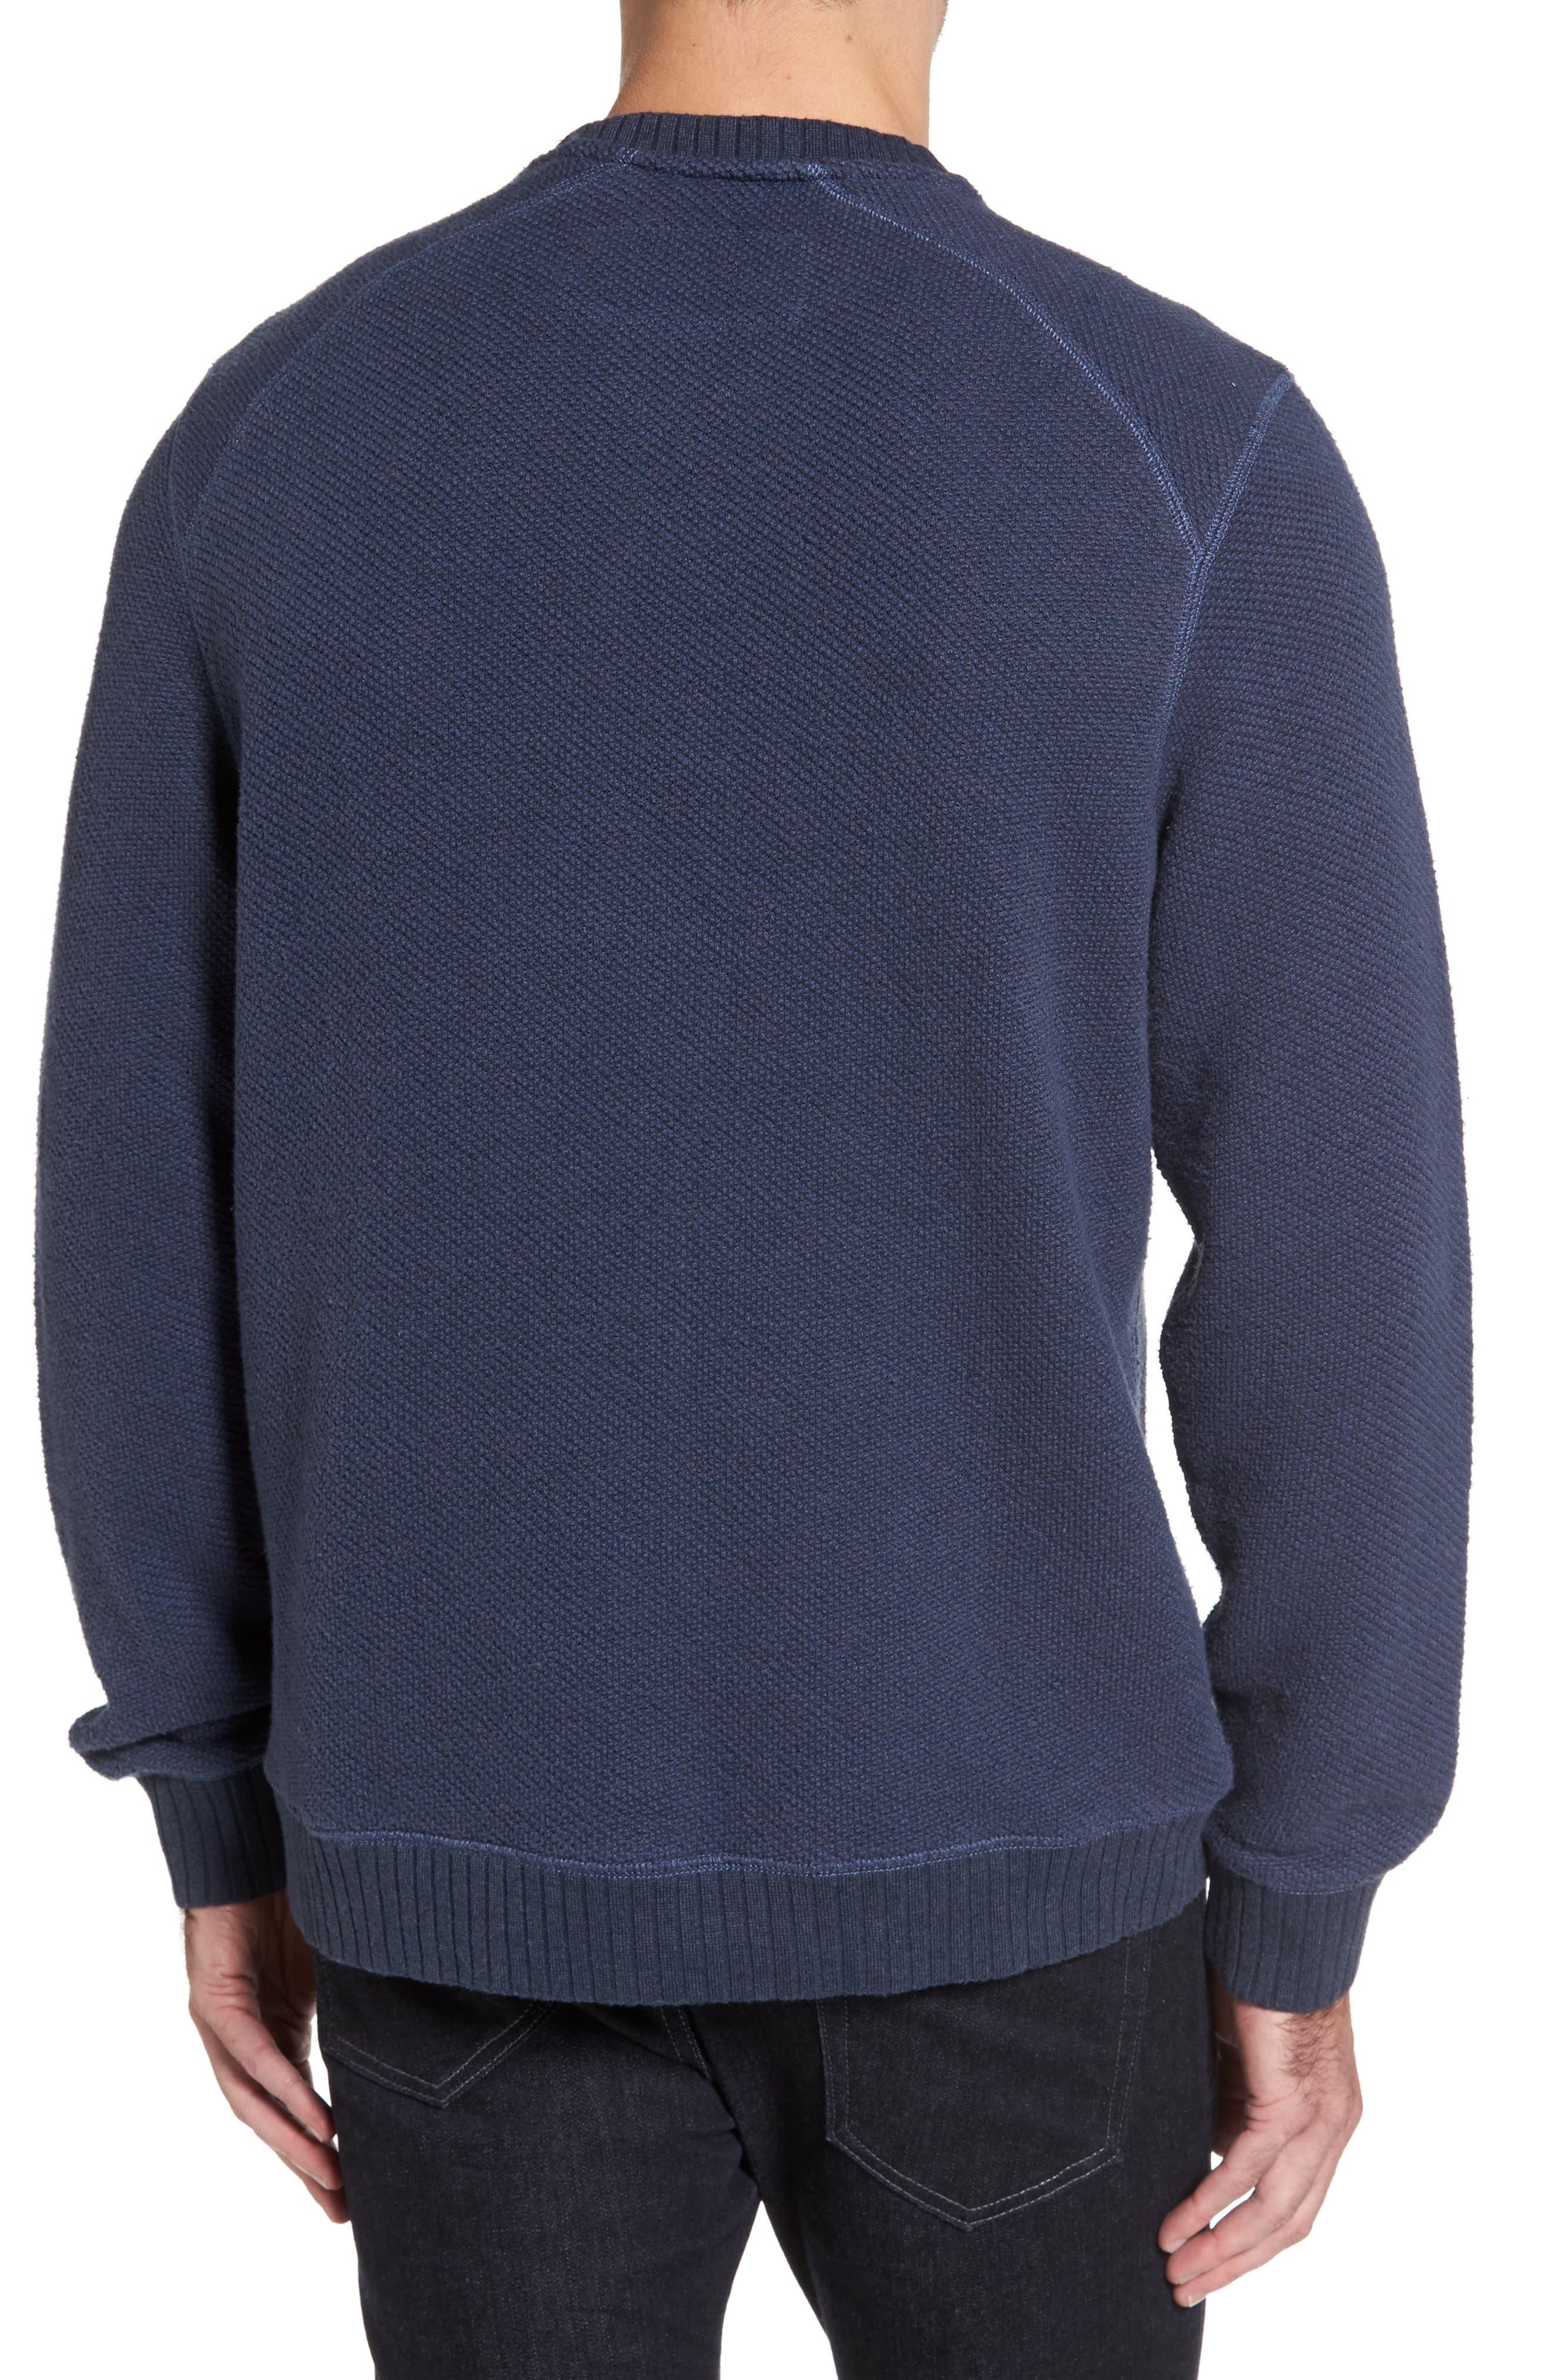 Surfari Crewneck Sweatshirt,                             Alternate thumbnail 2, color,                             001